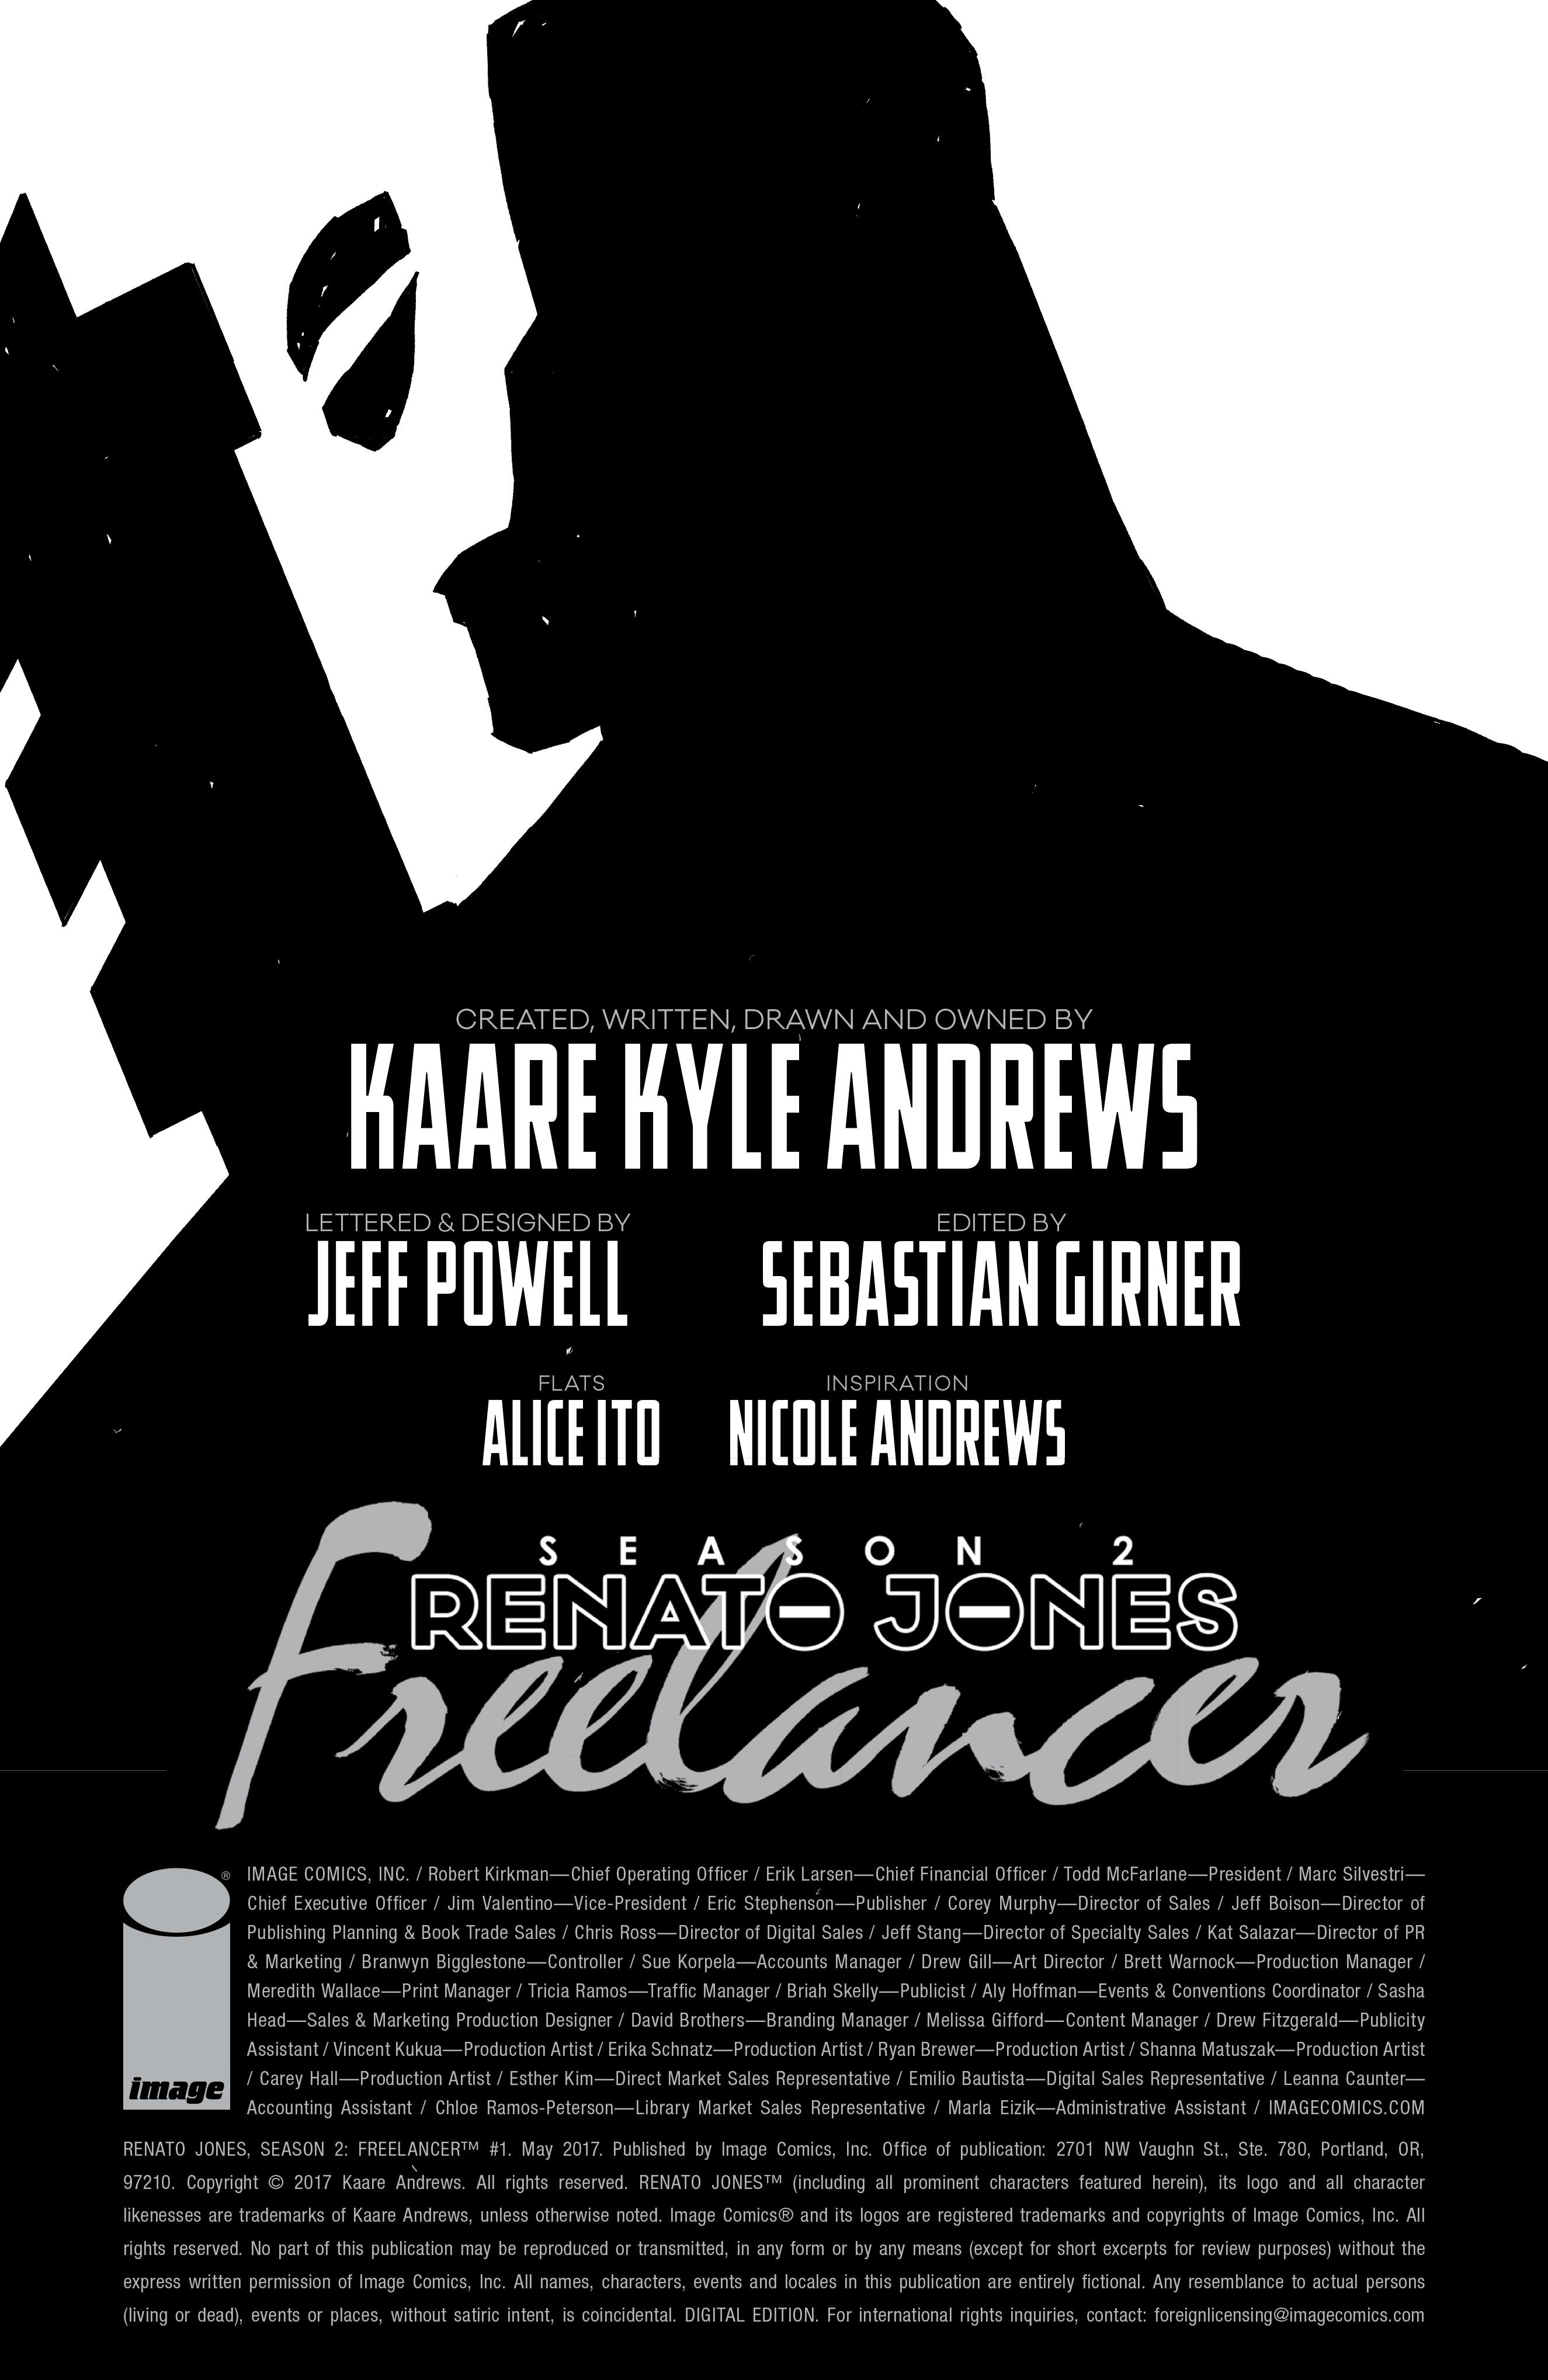 Read online Renato Jones, Season 2: Freelancer comic -  Issue #1 - 3